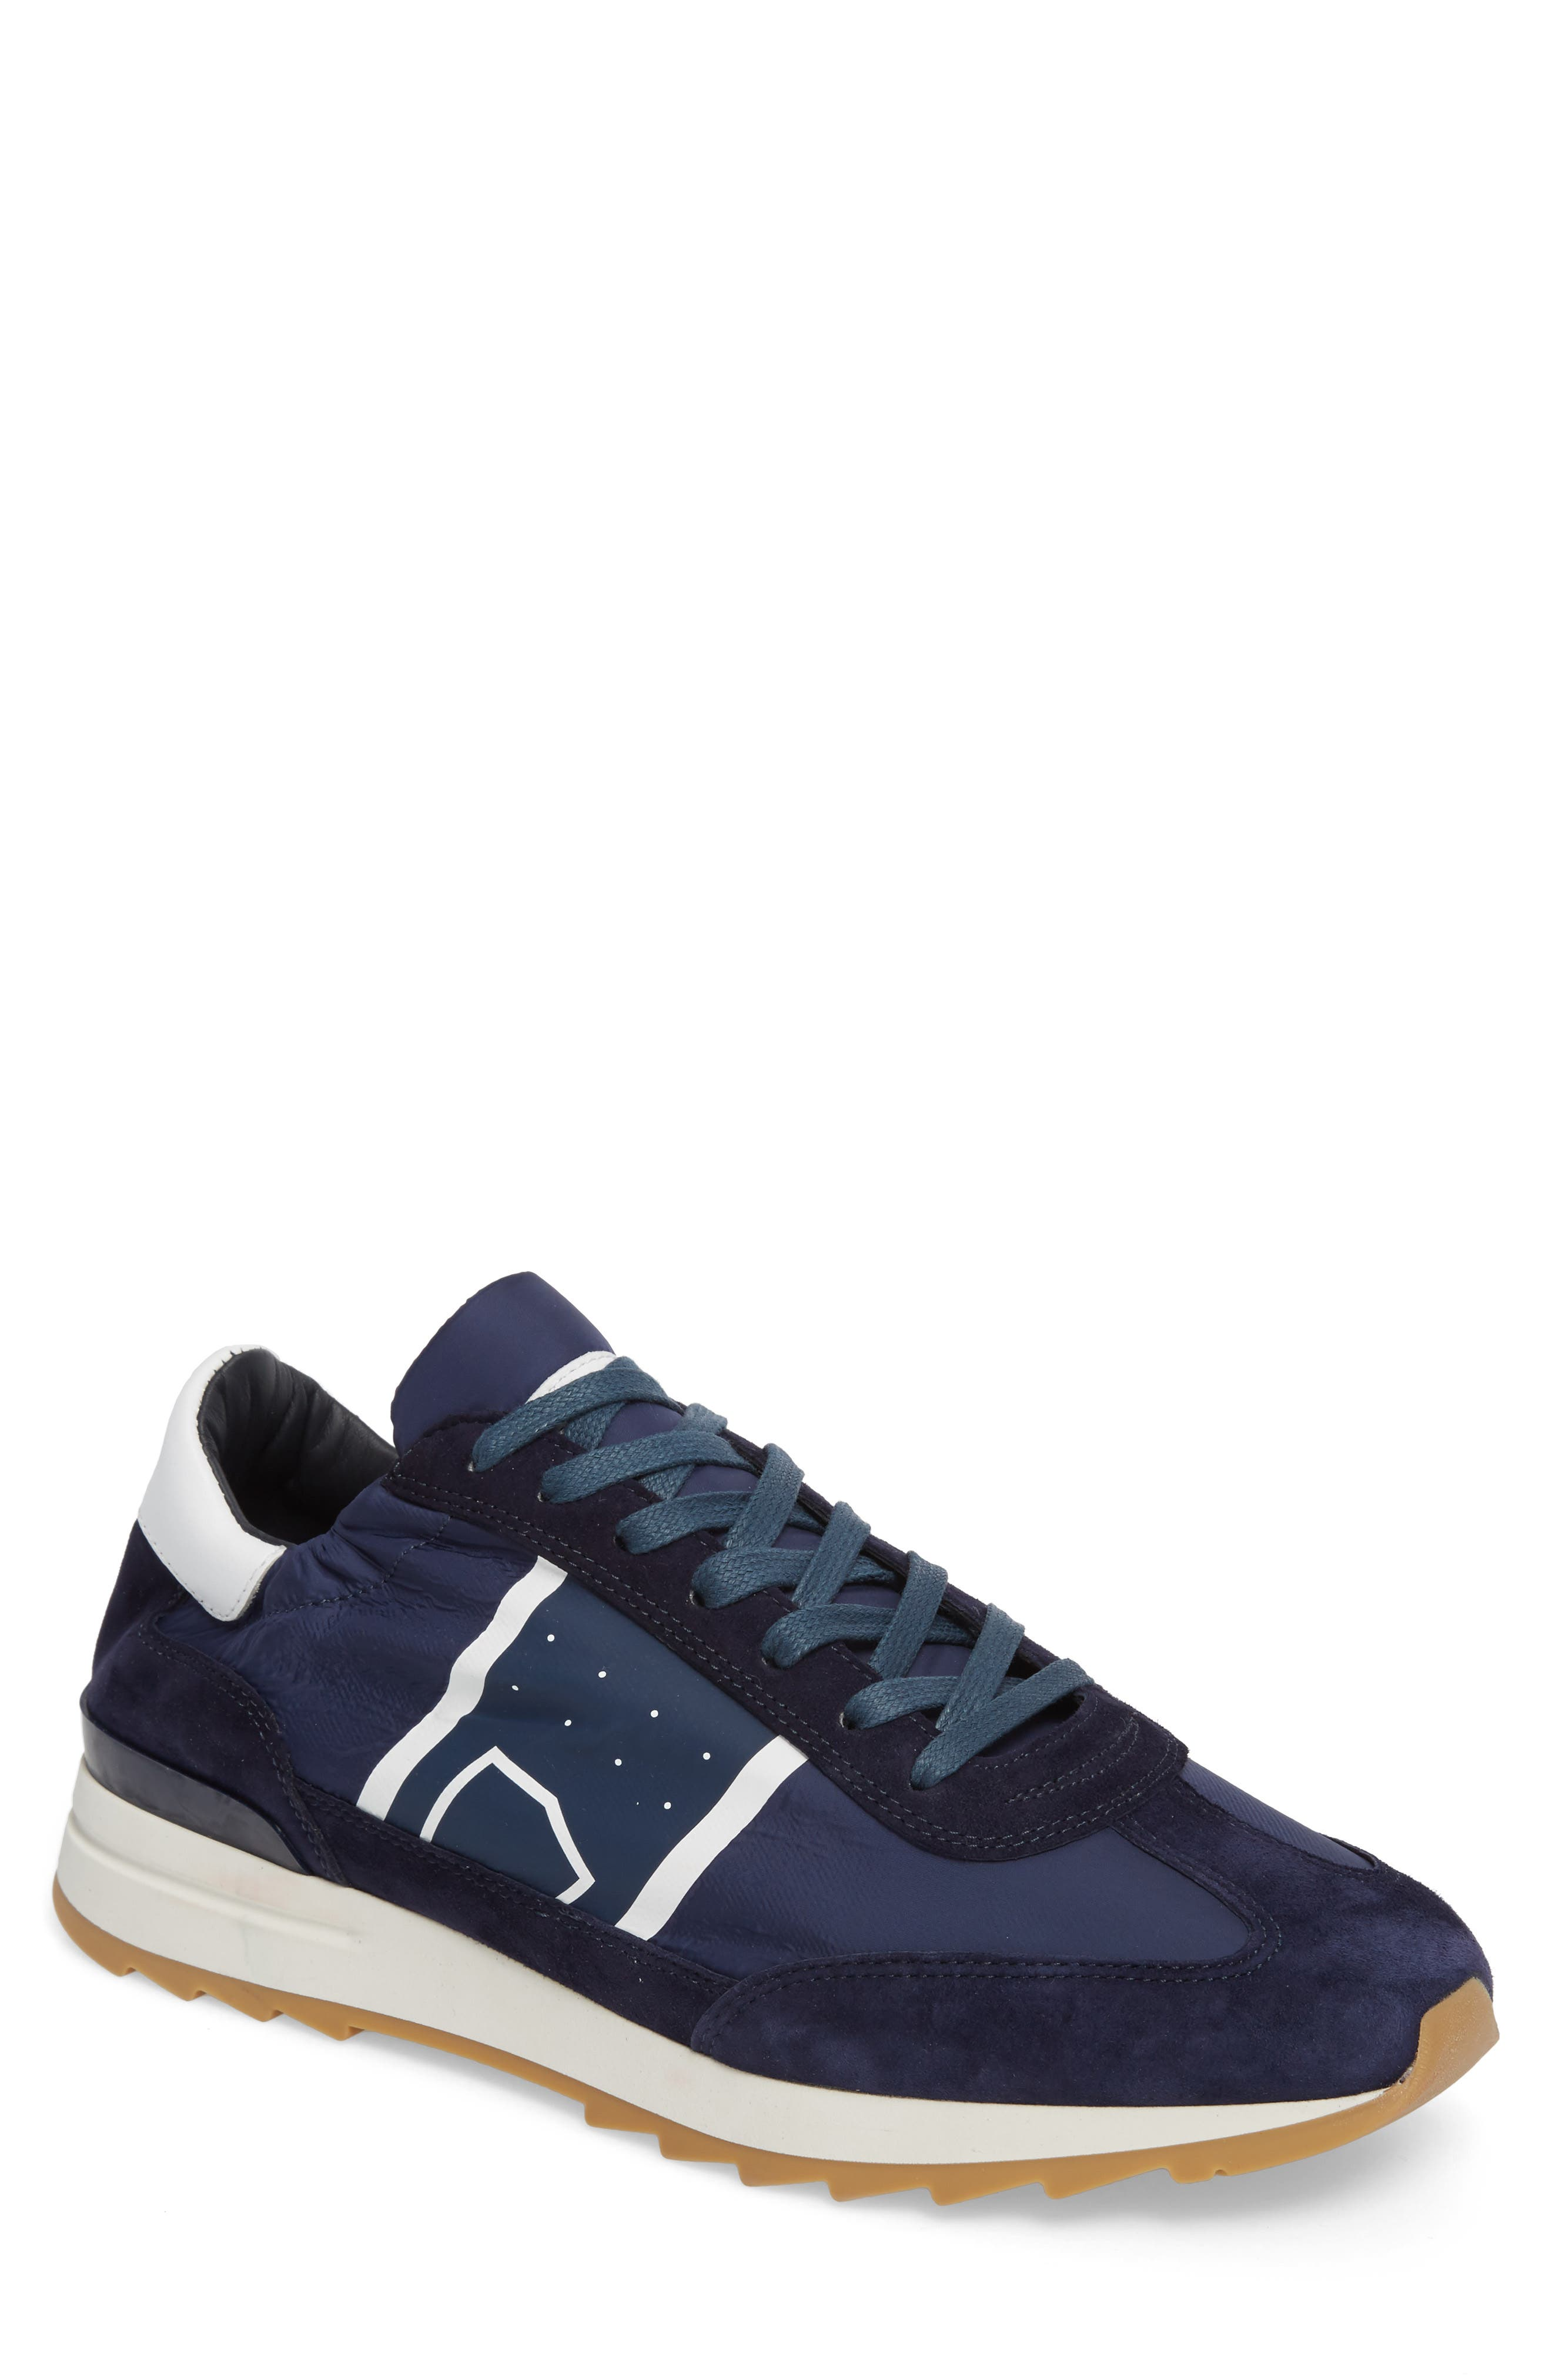 Toujours Sneaker,                             Main thumbnail 1, color,                             410